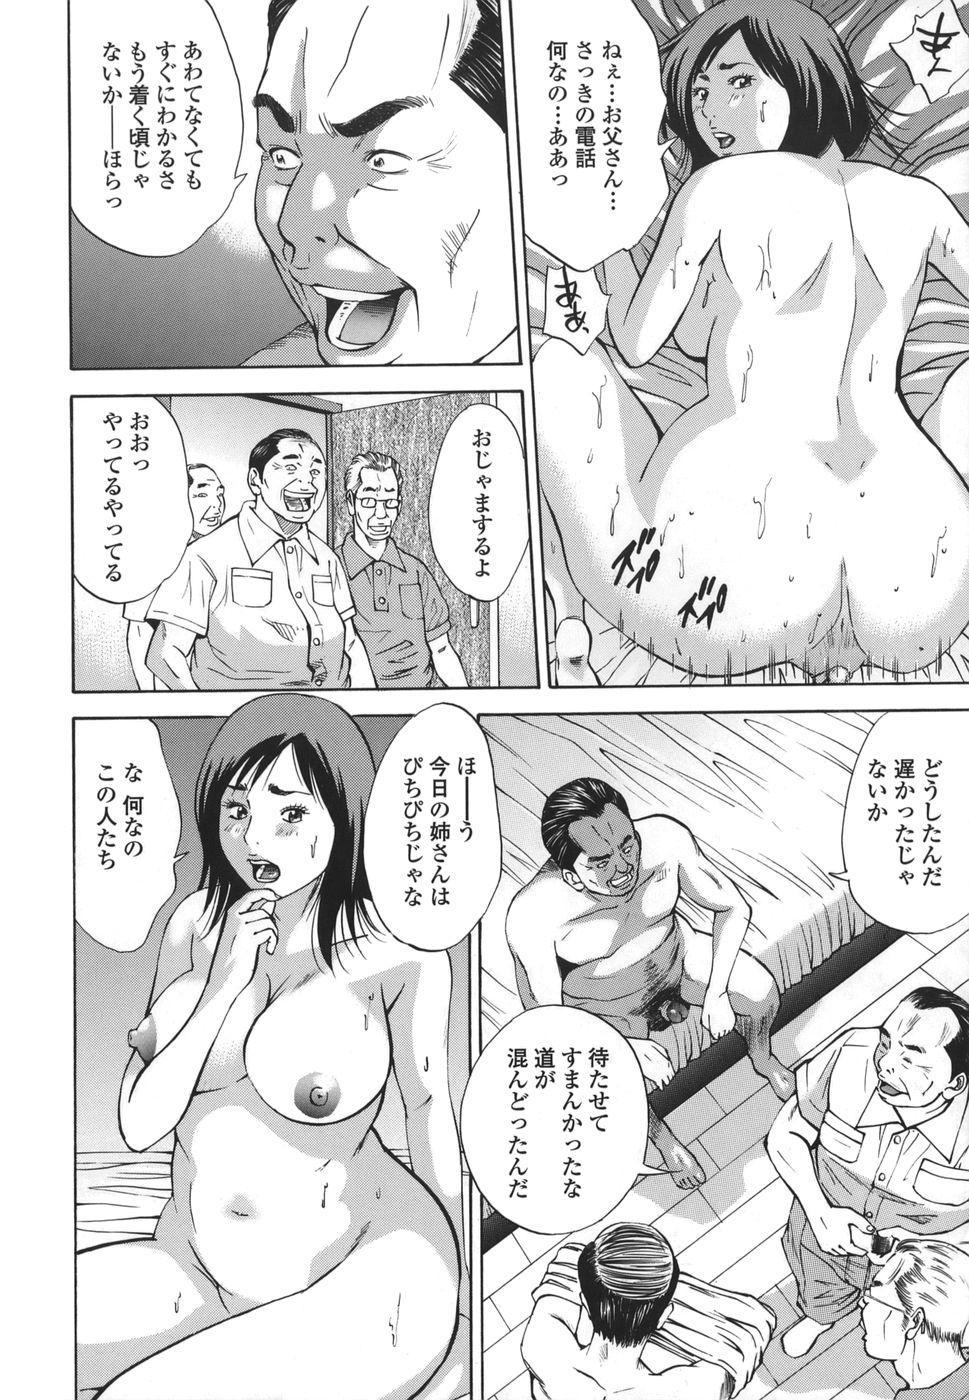 Kinshin Goukan - Near Relation Rapes 55